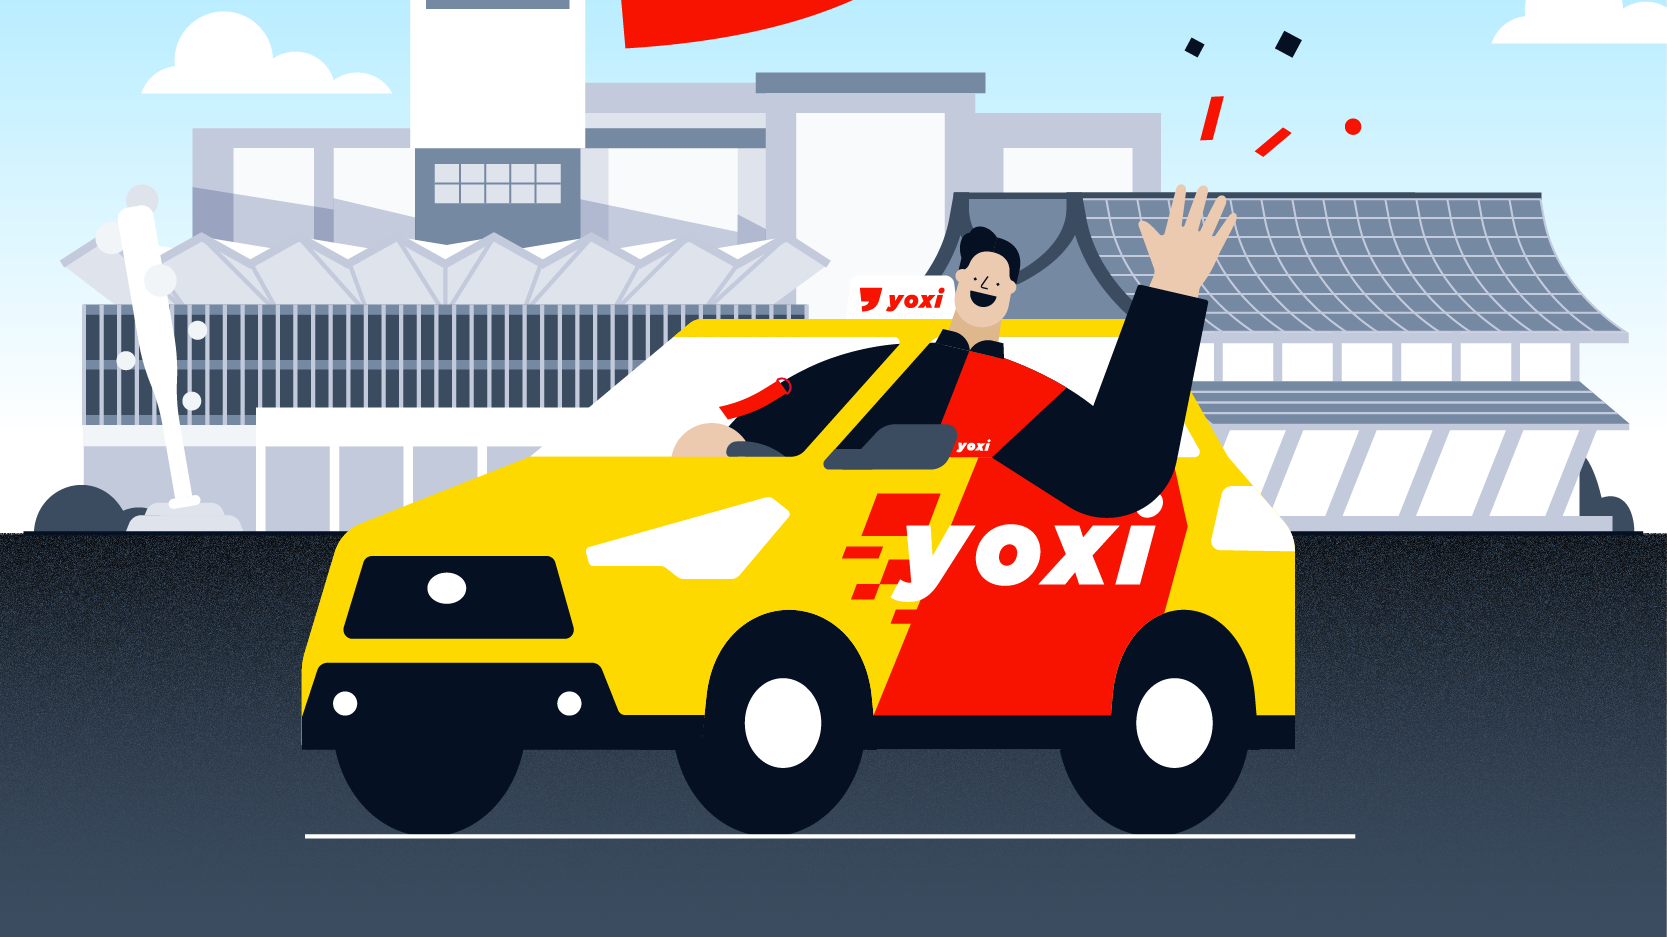 yoxi 進軍桃園,5/9 以前送 700 元搭車金!